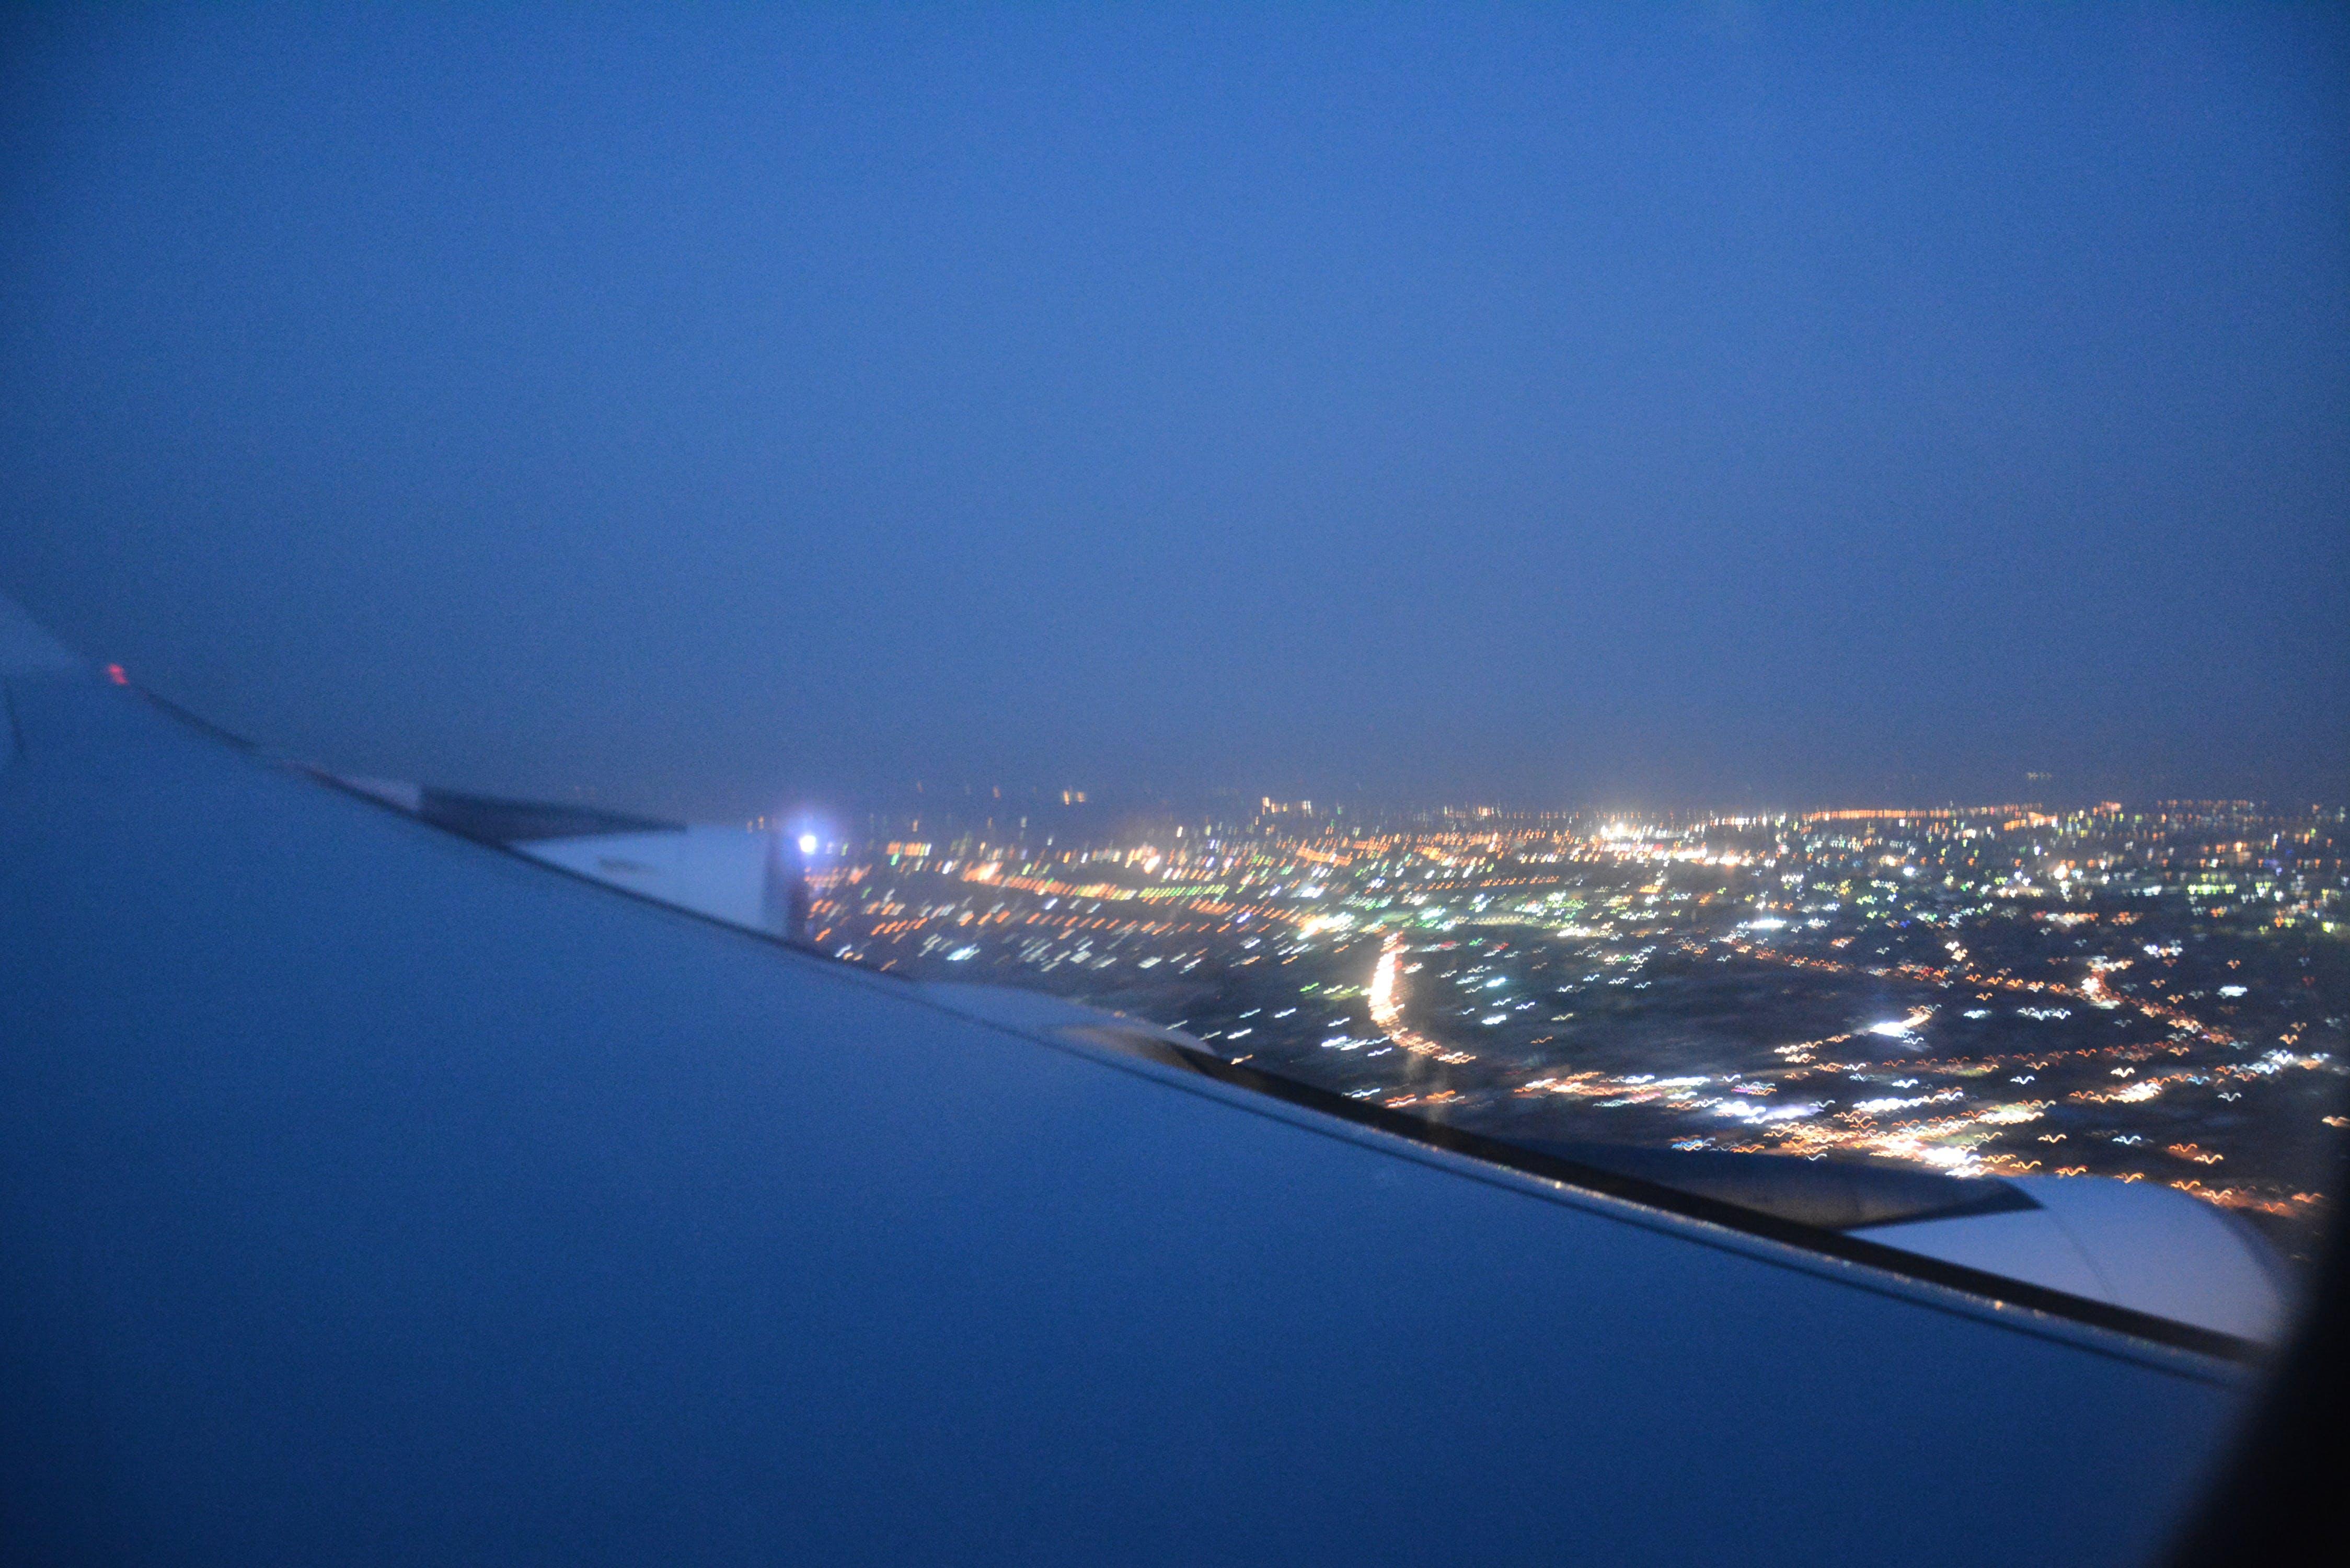 Free stock photo of airplane view, blue sky, city at night, night lights